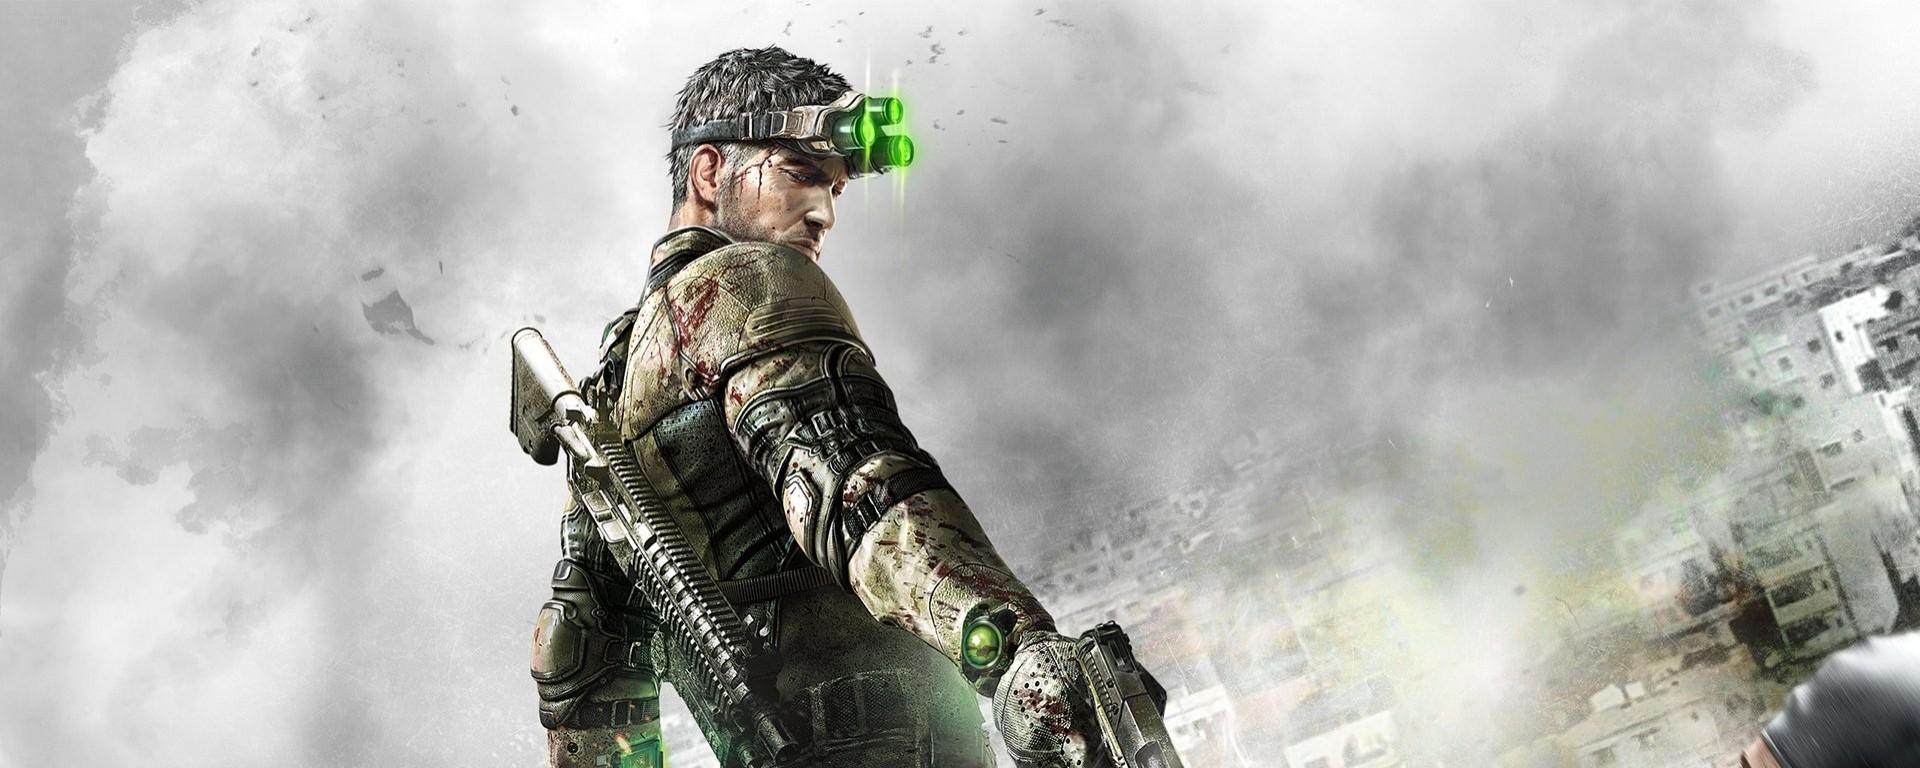 splinter-cell-blacklist-jogo-tom-clancy-s-dumau-games-392326